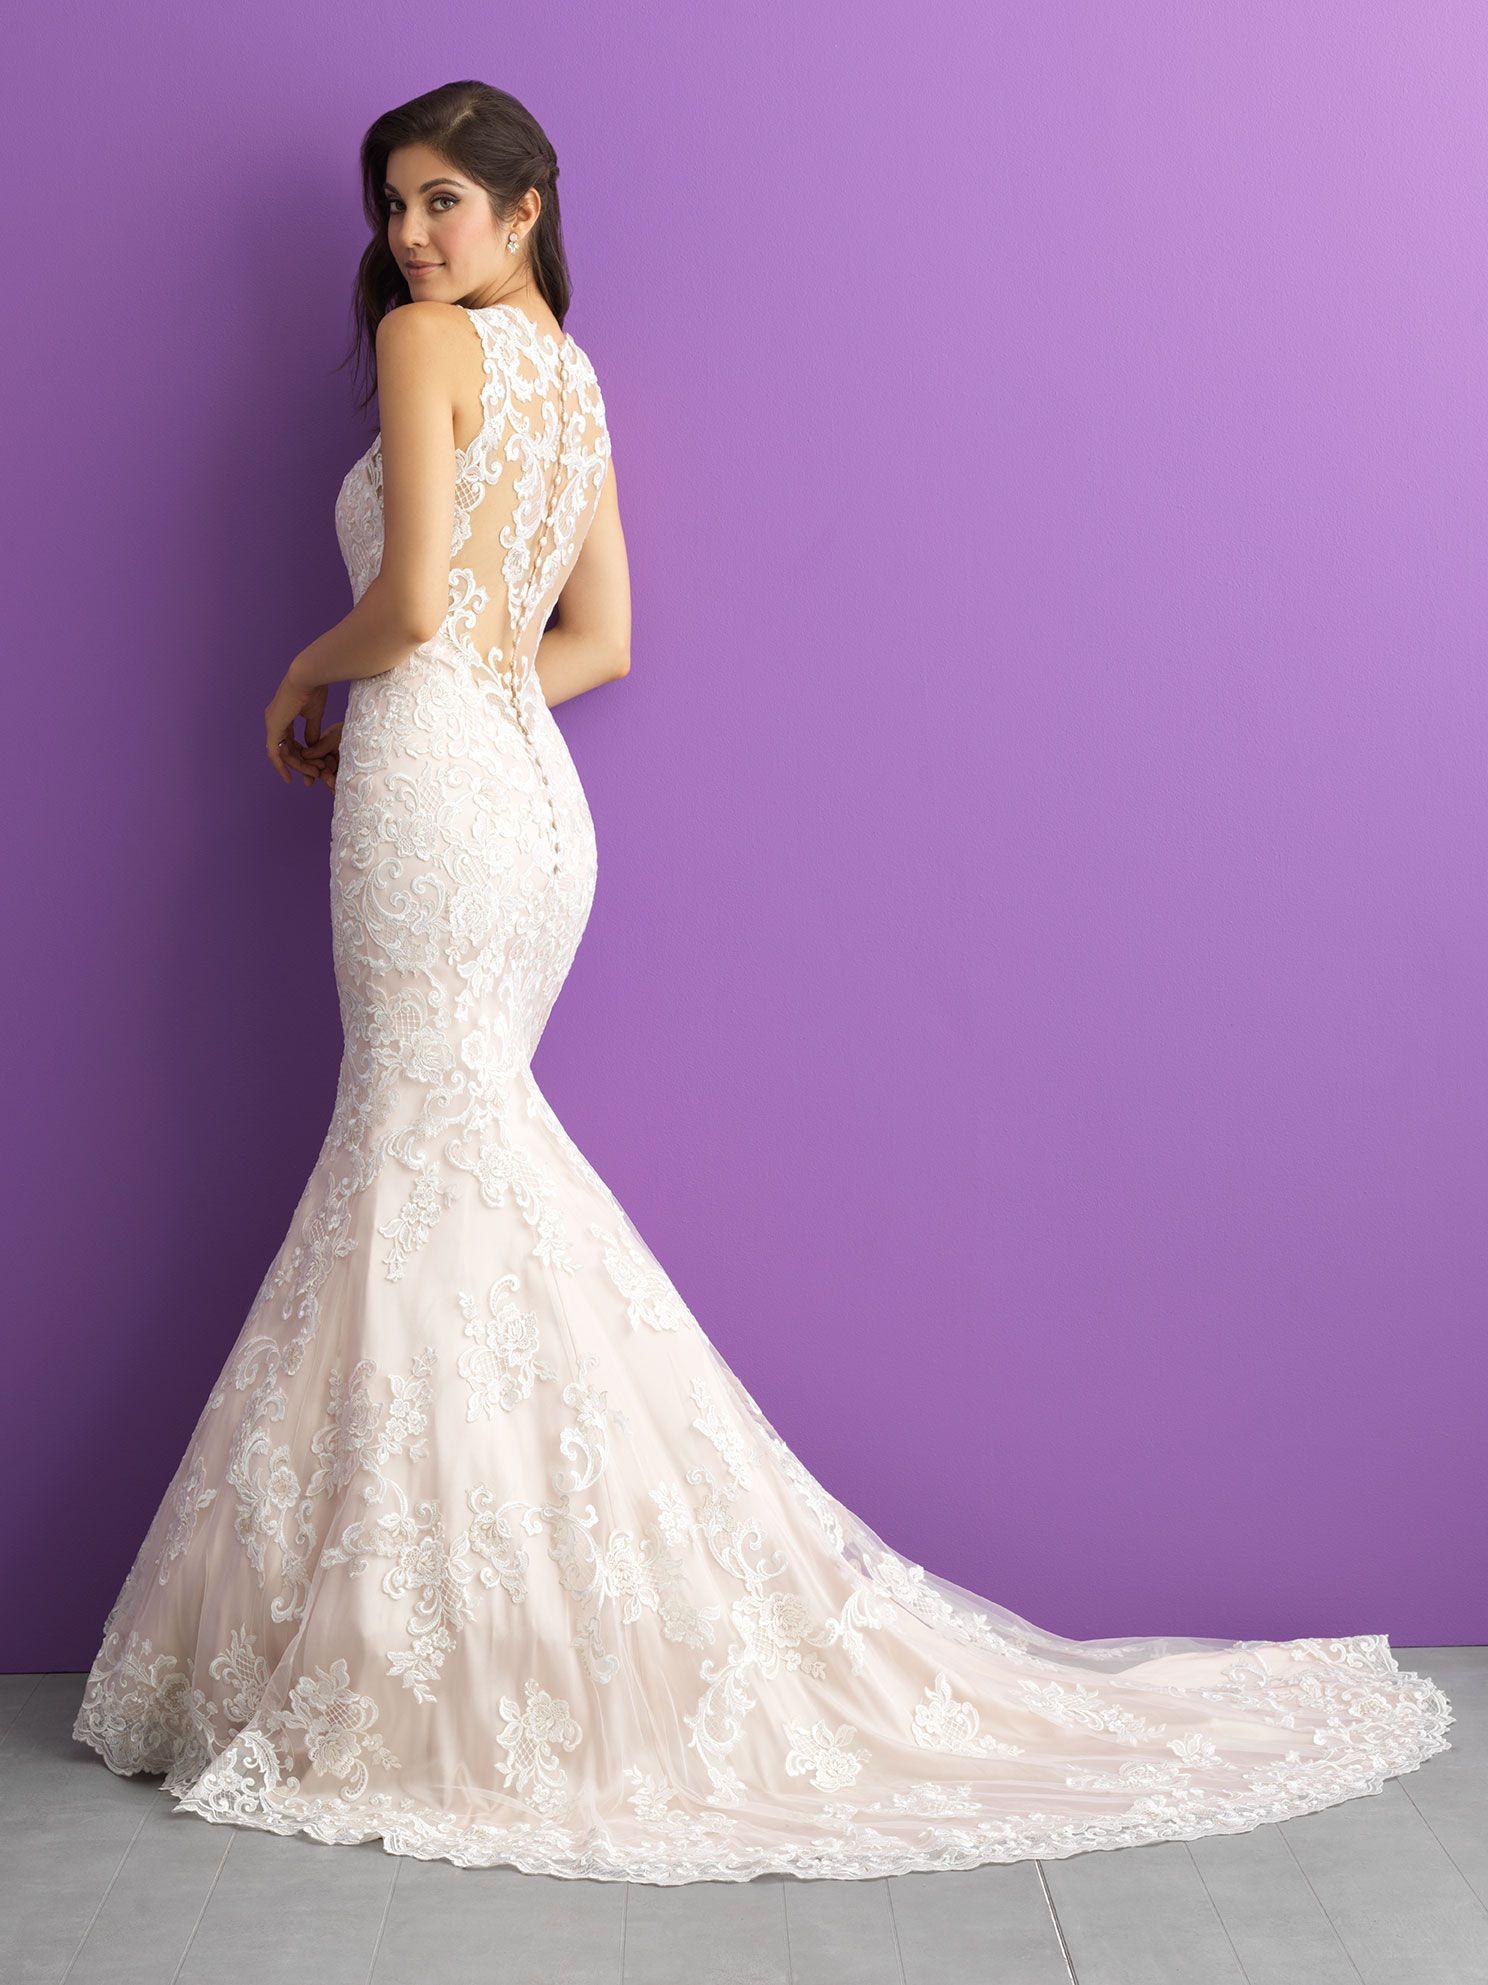 Hermosa Vestido De Novia De Alquiler Tampa Ideas - Vestido de Novia ...